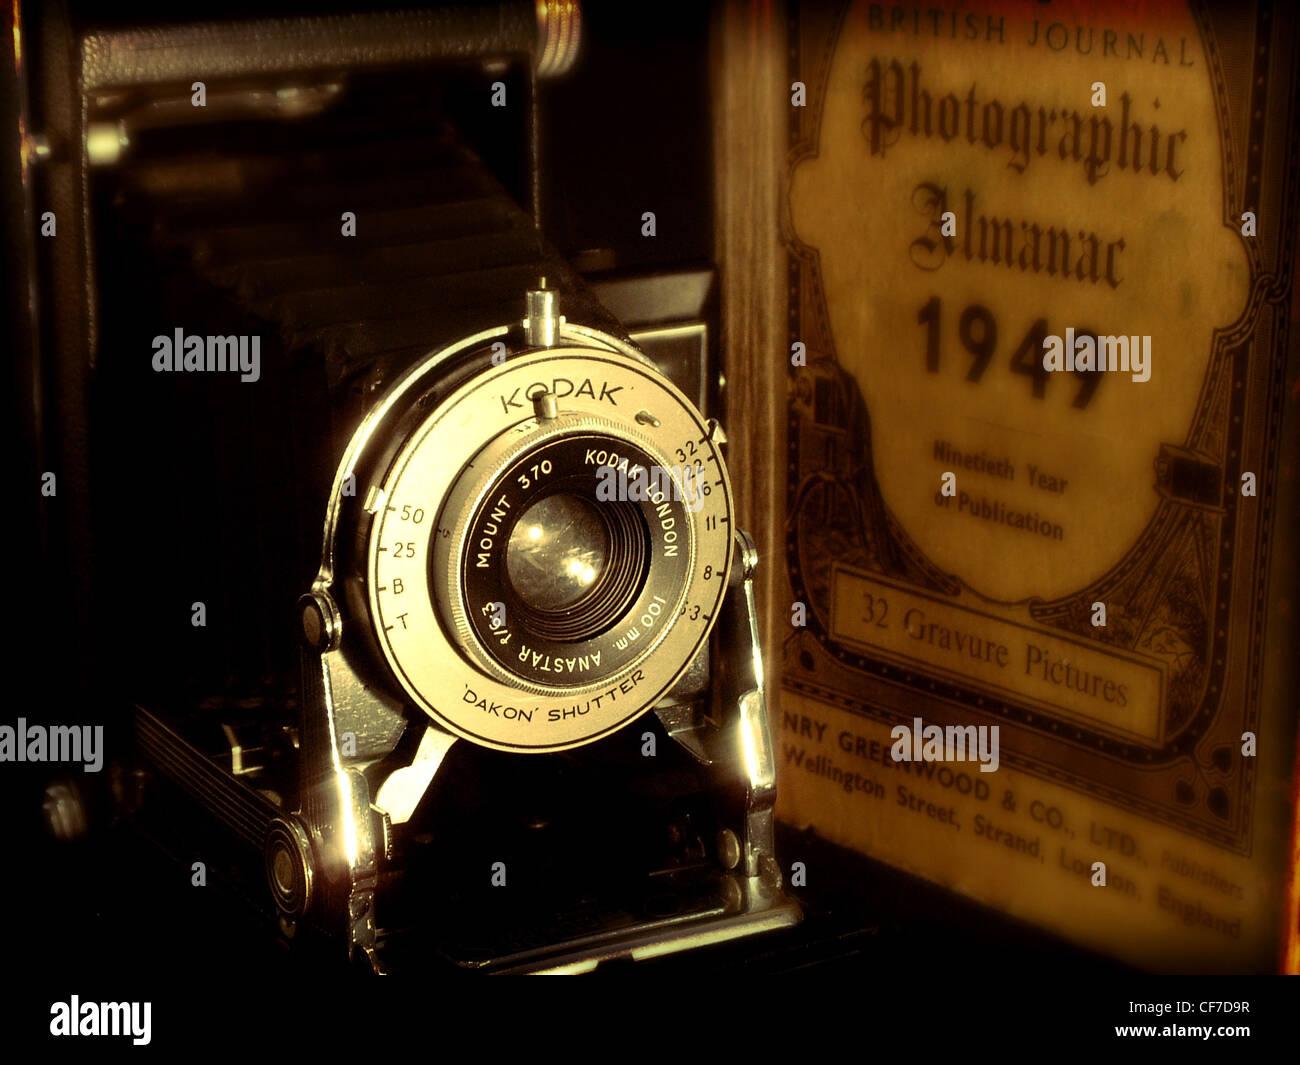 Kodak,brownie,camera,and,Photographic,Almanac,1949,old,vintage,shot,sepia,antique,made,in,england,britain,lens,shutter,gotonysmith,Dakon,shutter,british,photographers,gotonysmith,Buy Pictures of,Buy Images Of